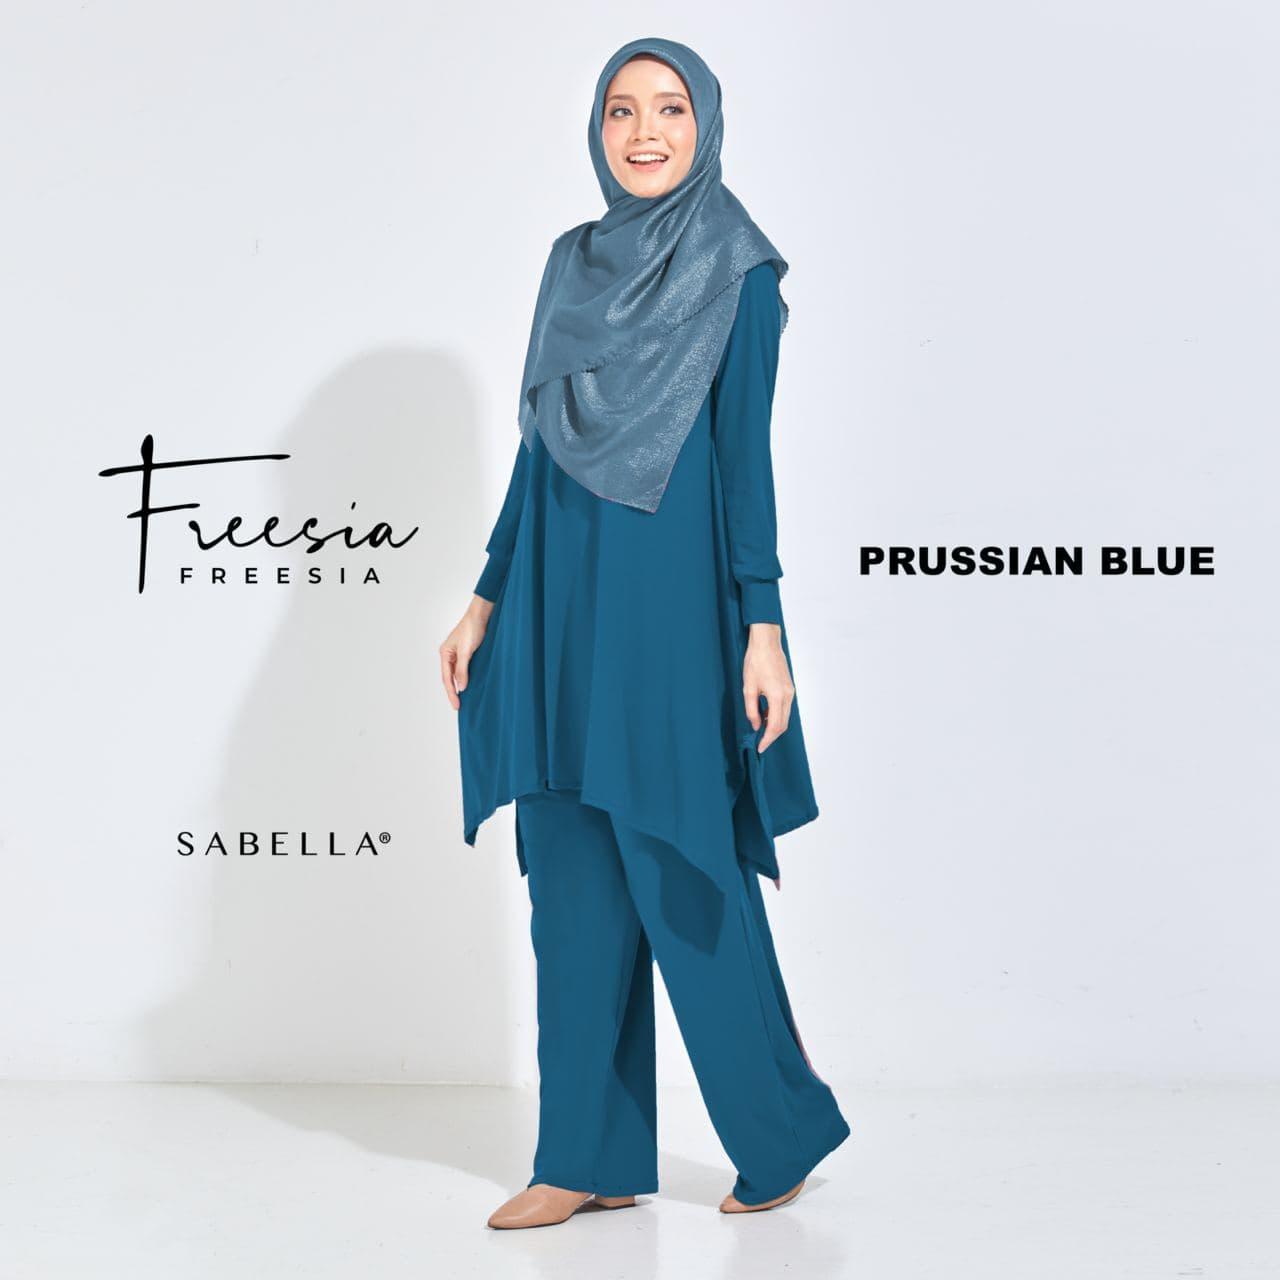 Freesia Prussian Blue (R)